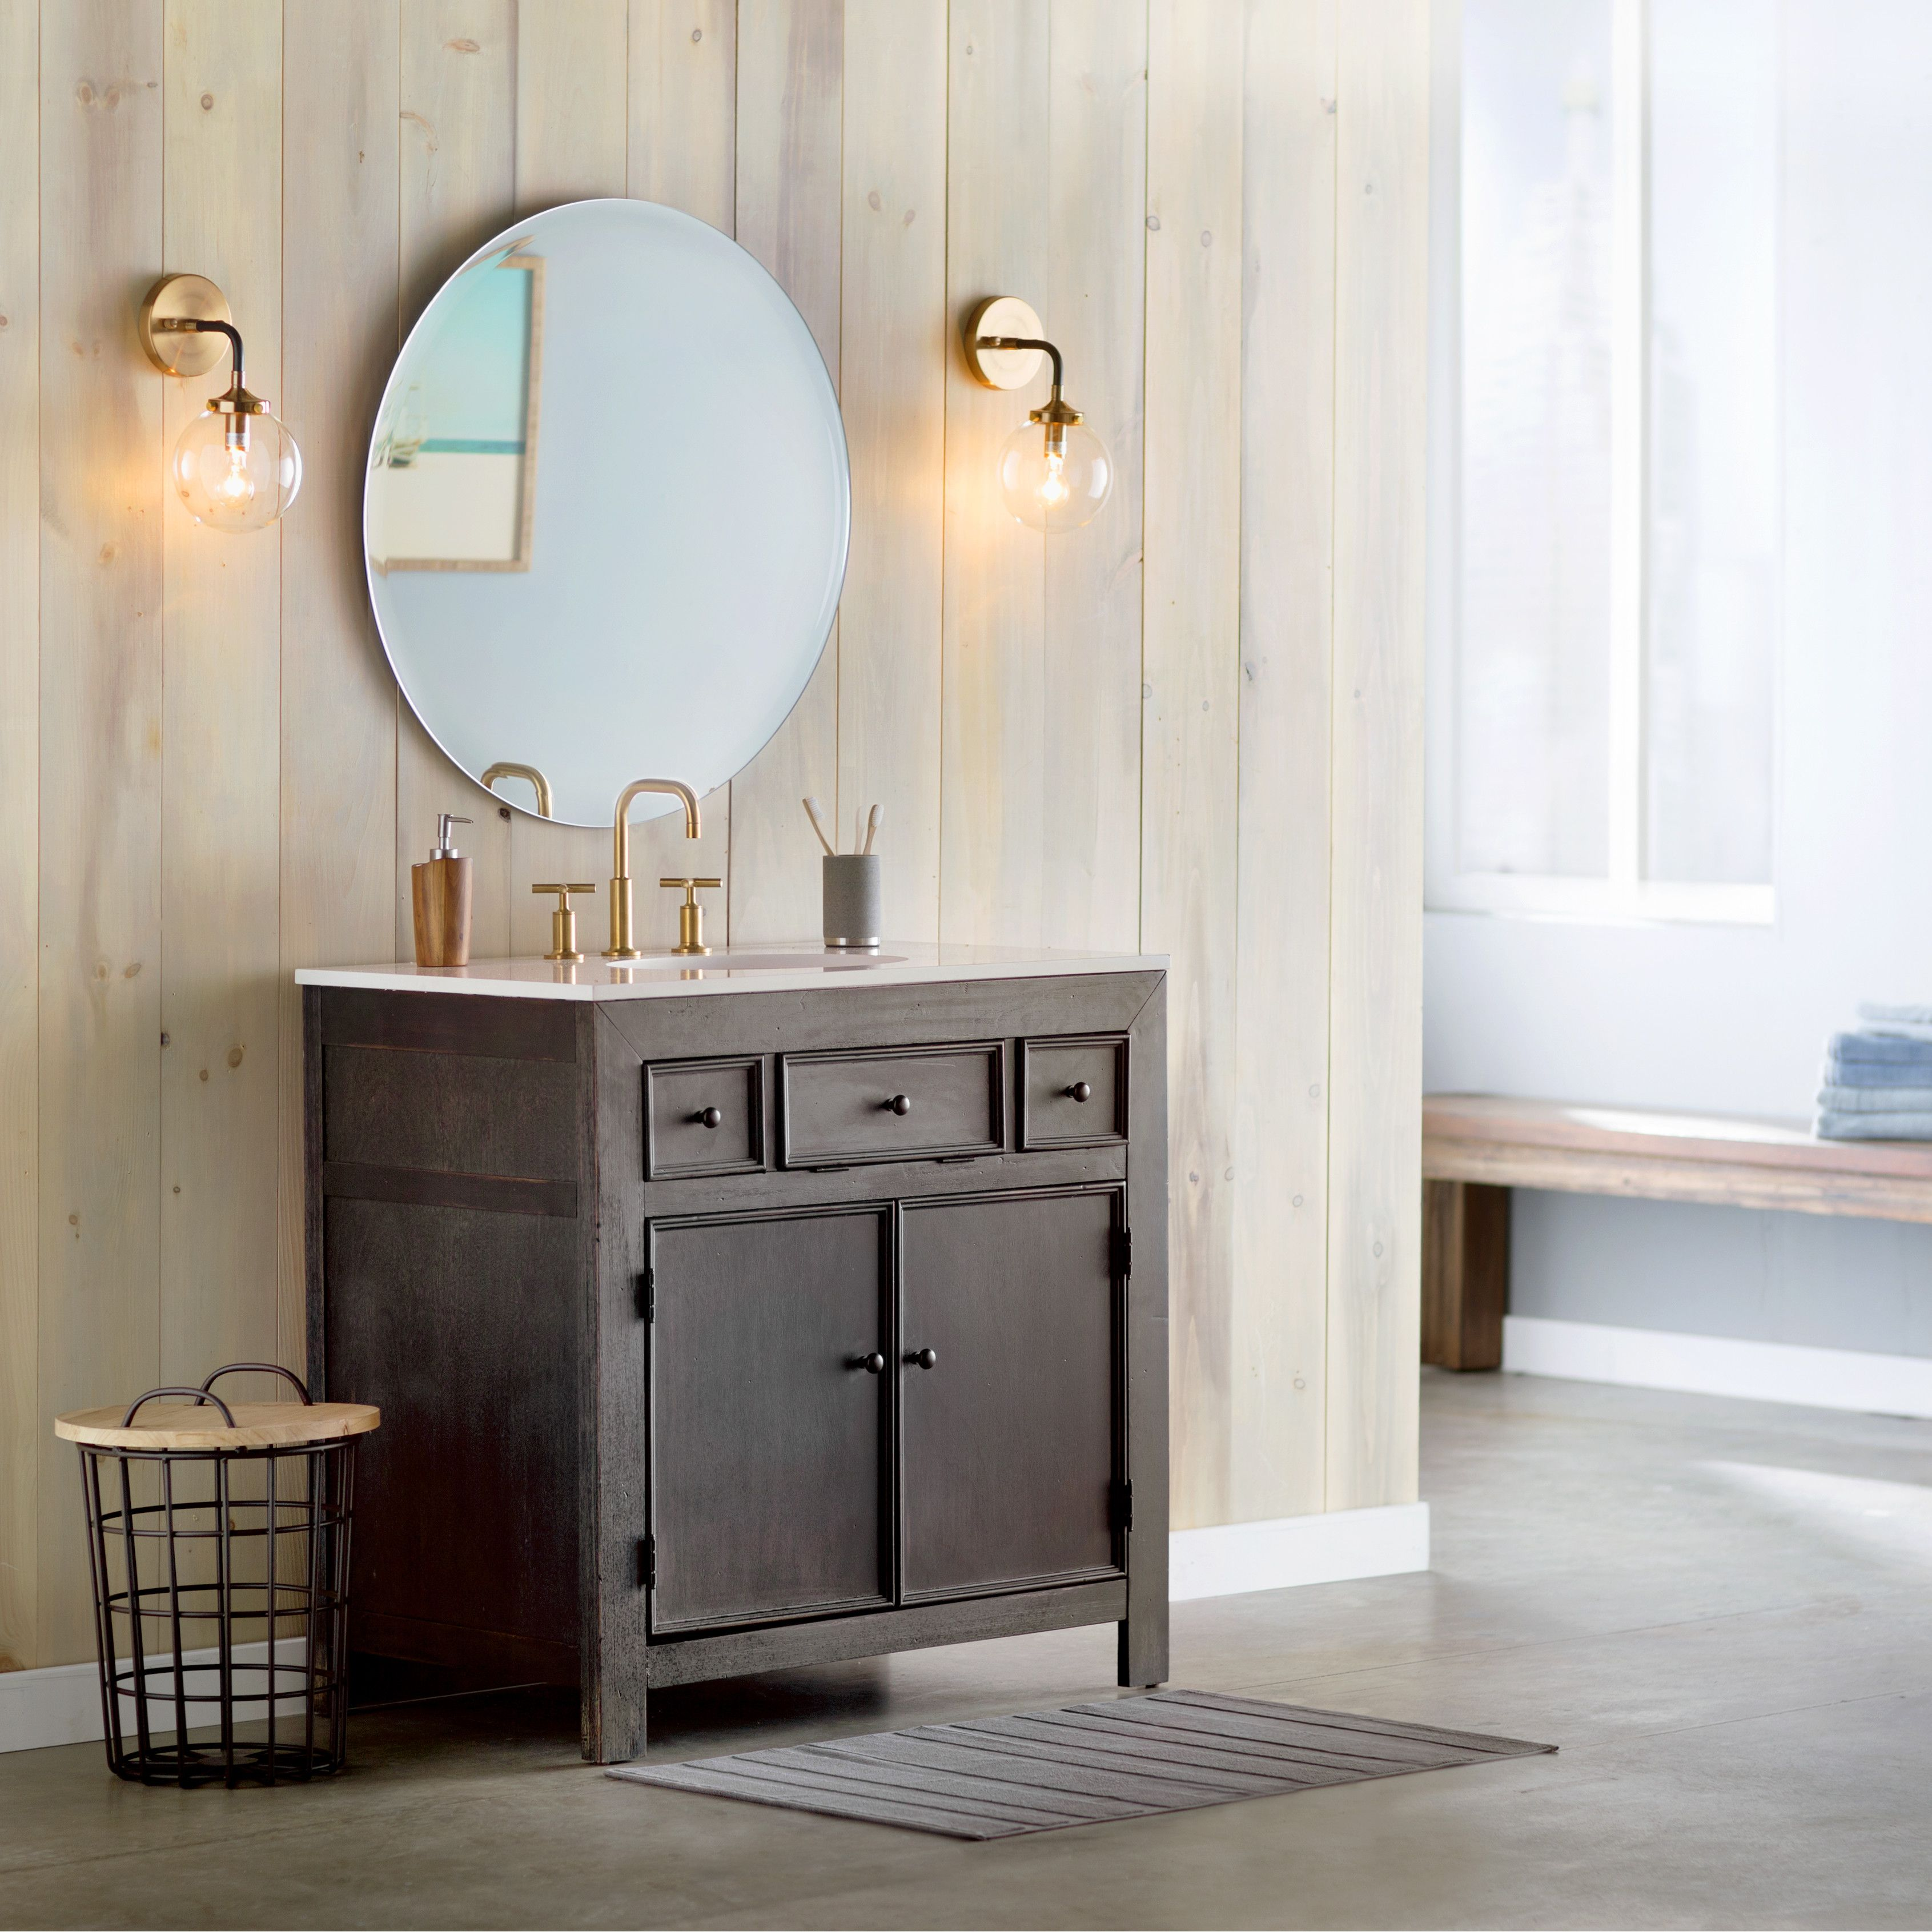 Round mirror. Round mirror bathroom, Bathroom sconces